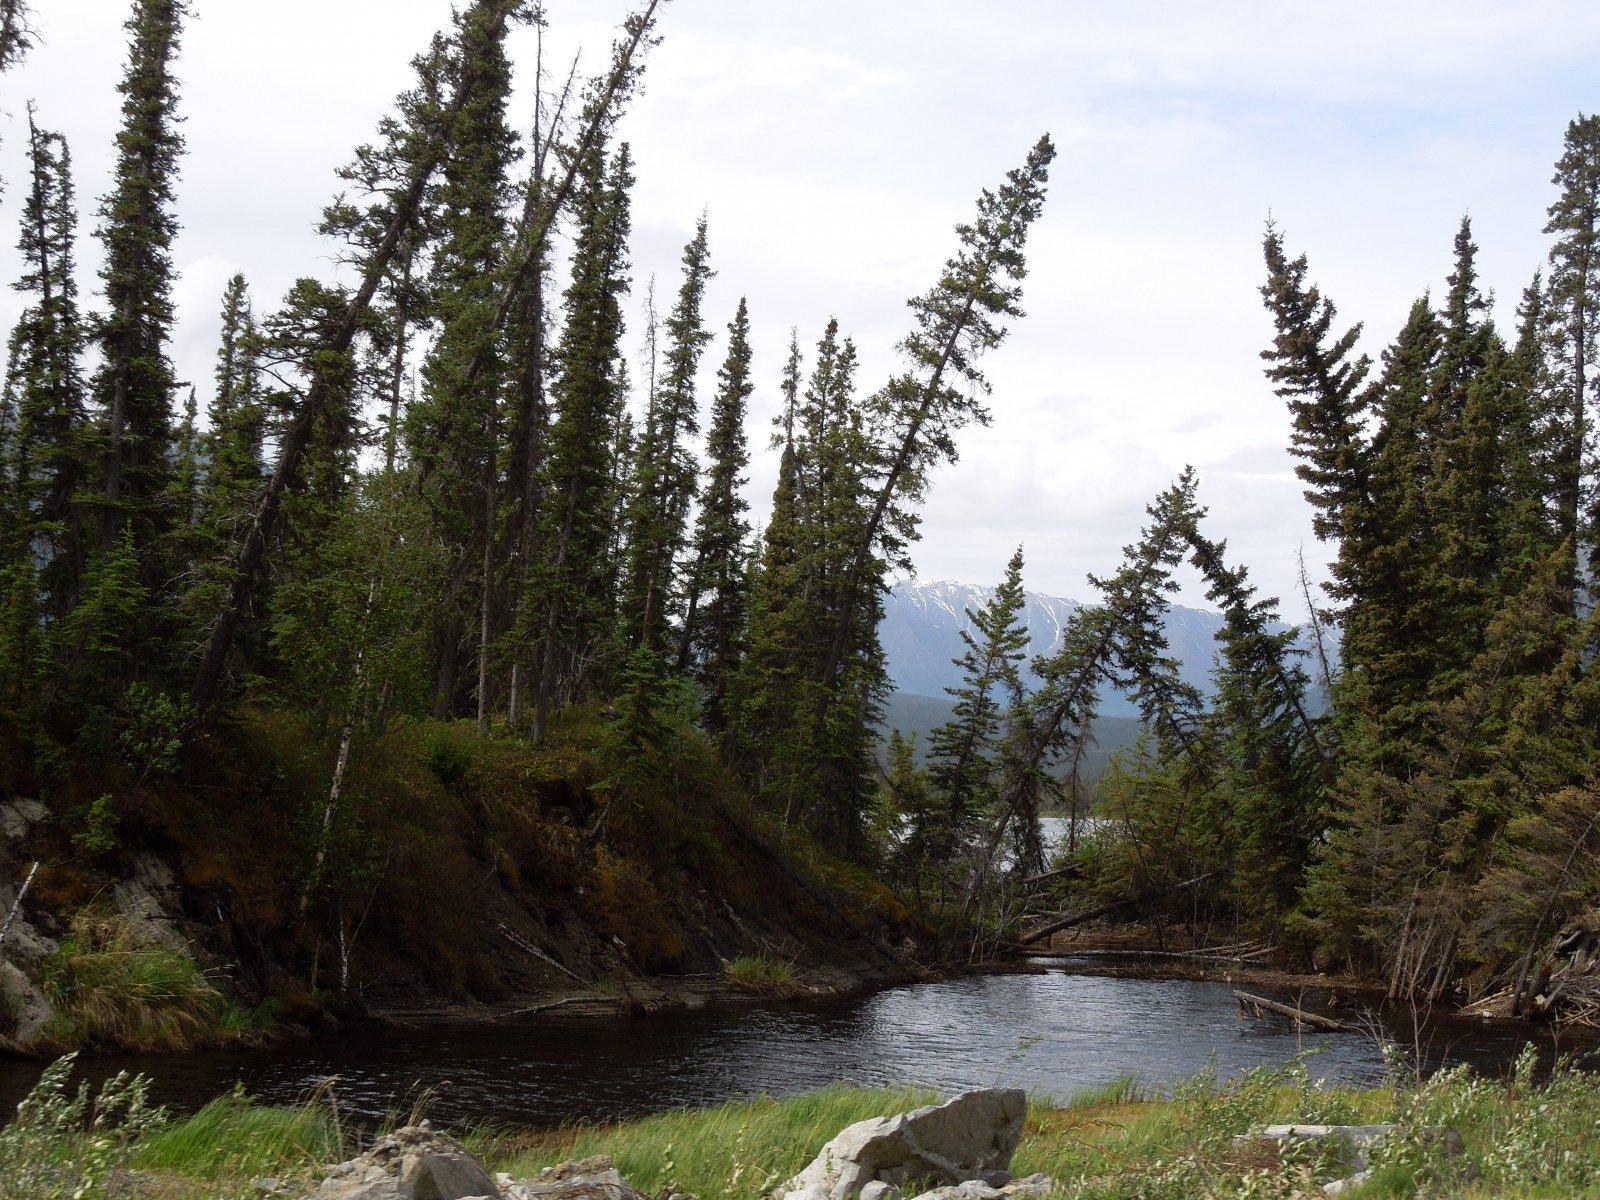 Click image for larger version  Name:Destruction Bay, YK to Tok, Alaska 008.jpg Views:66 Size:503.6 KB ID:215273